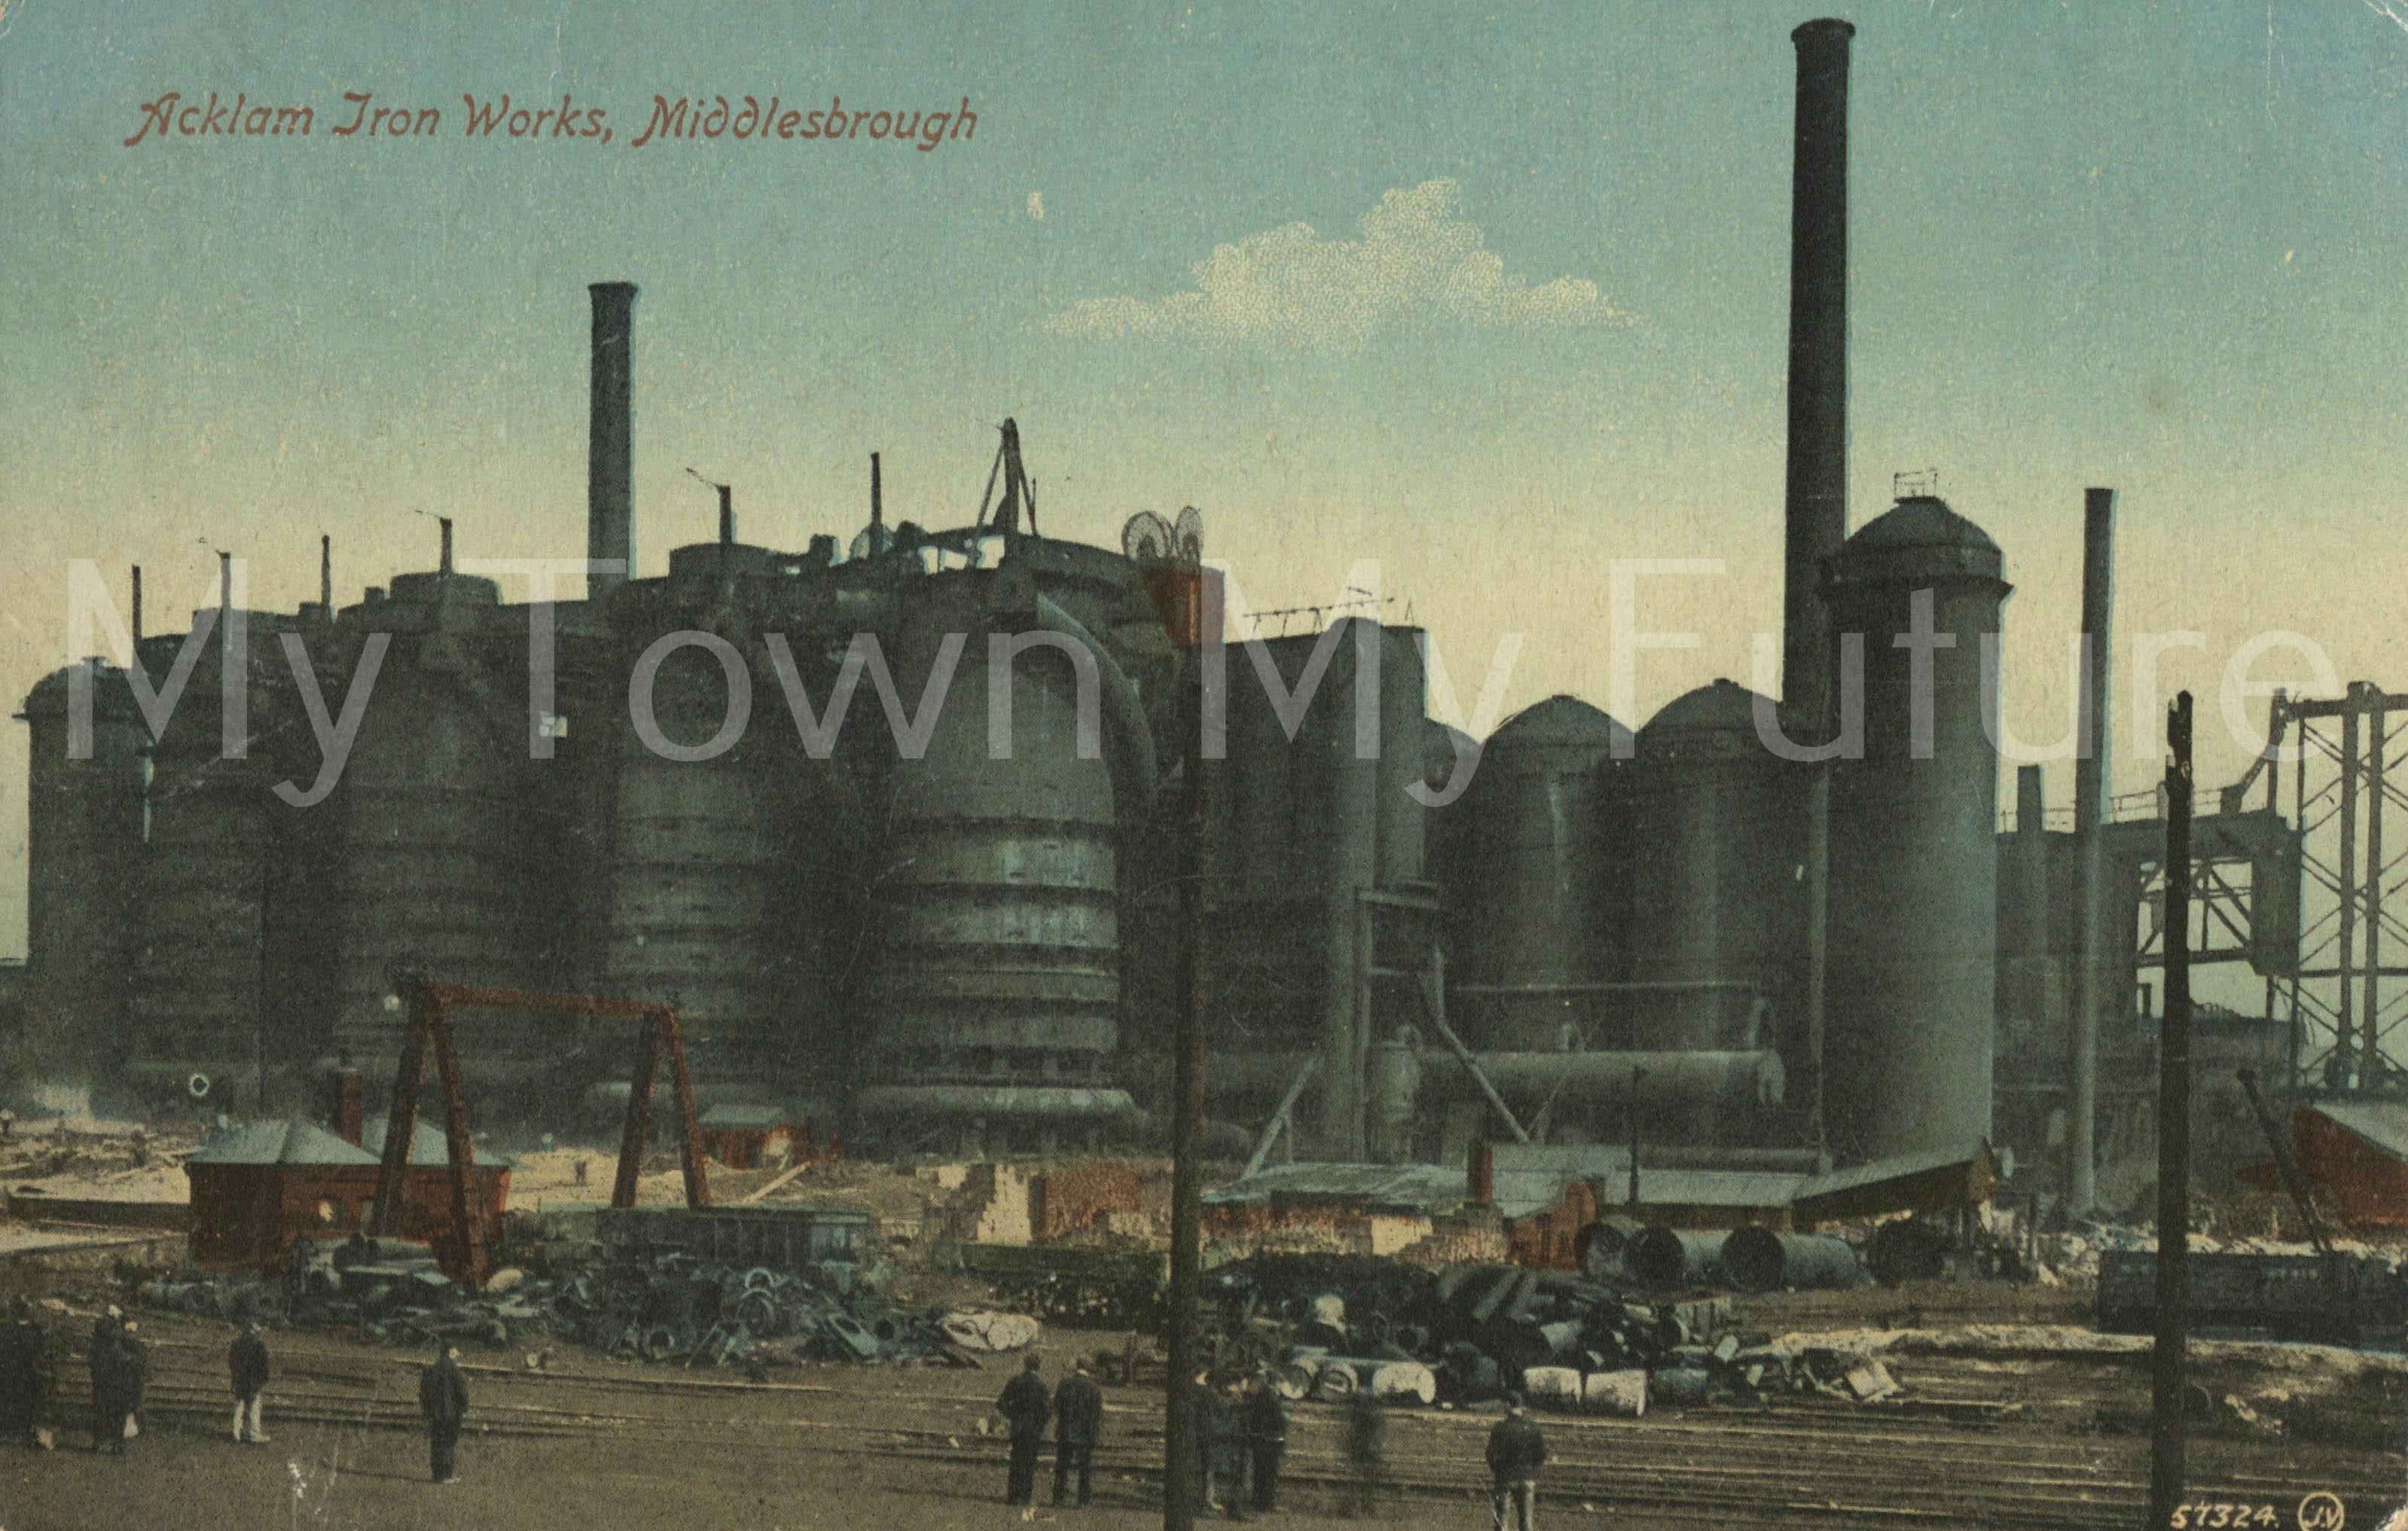 Acklam Iron Works